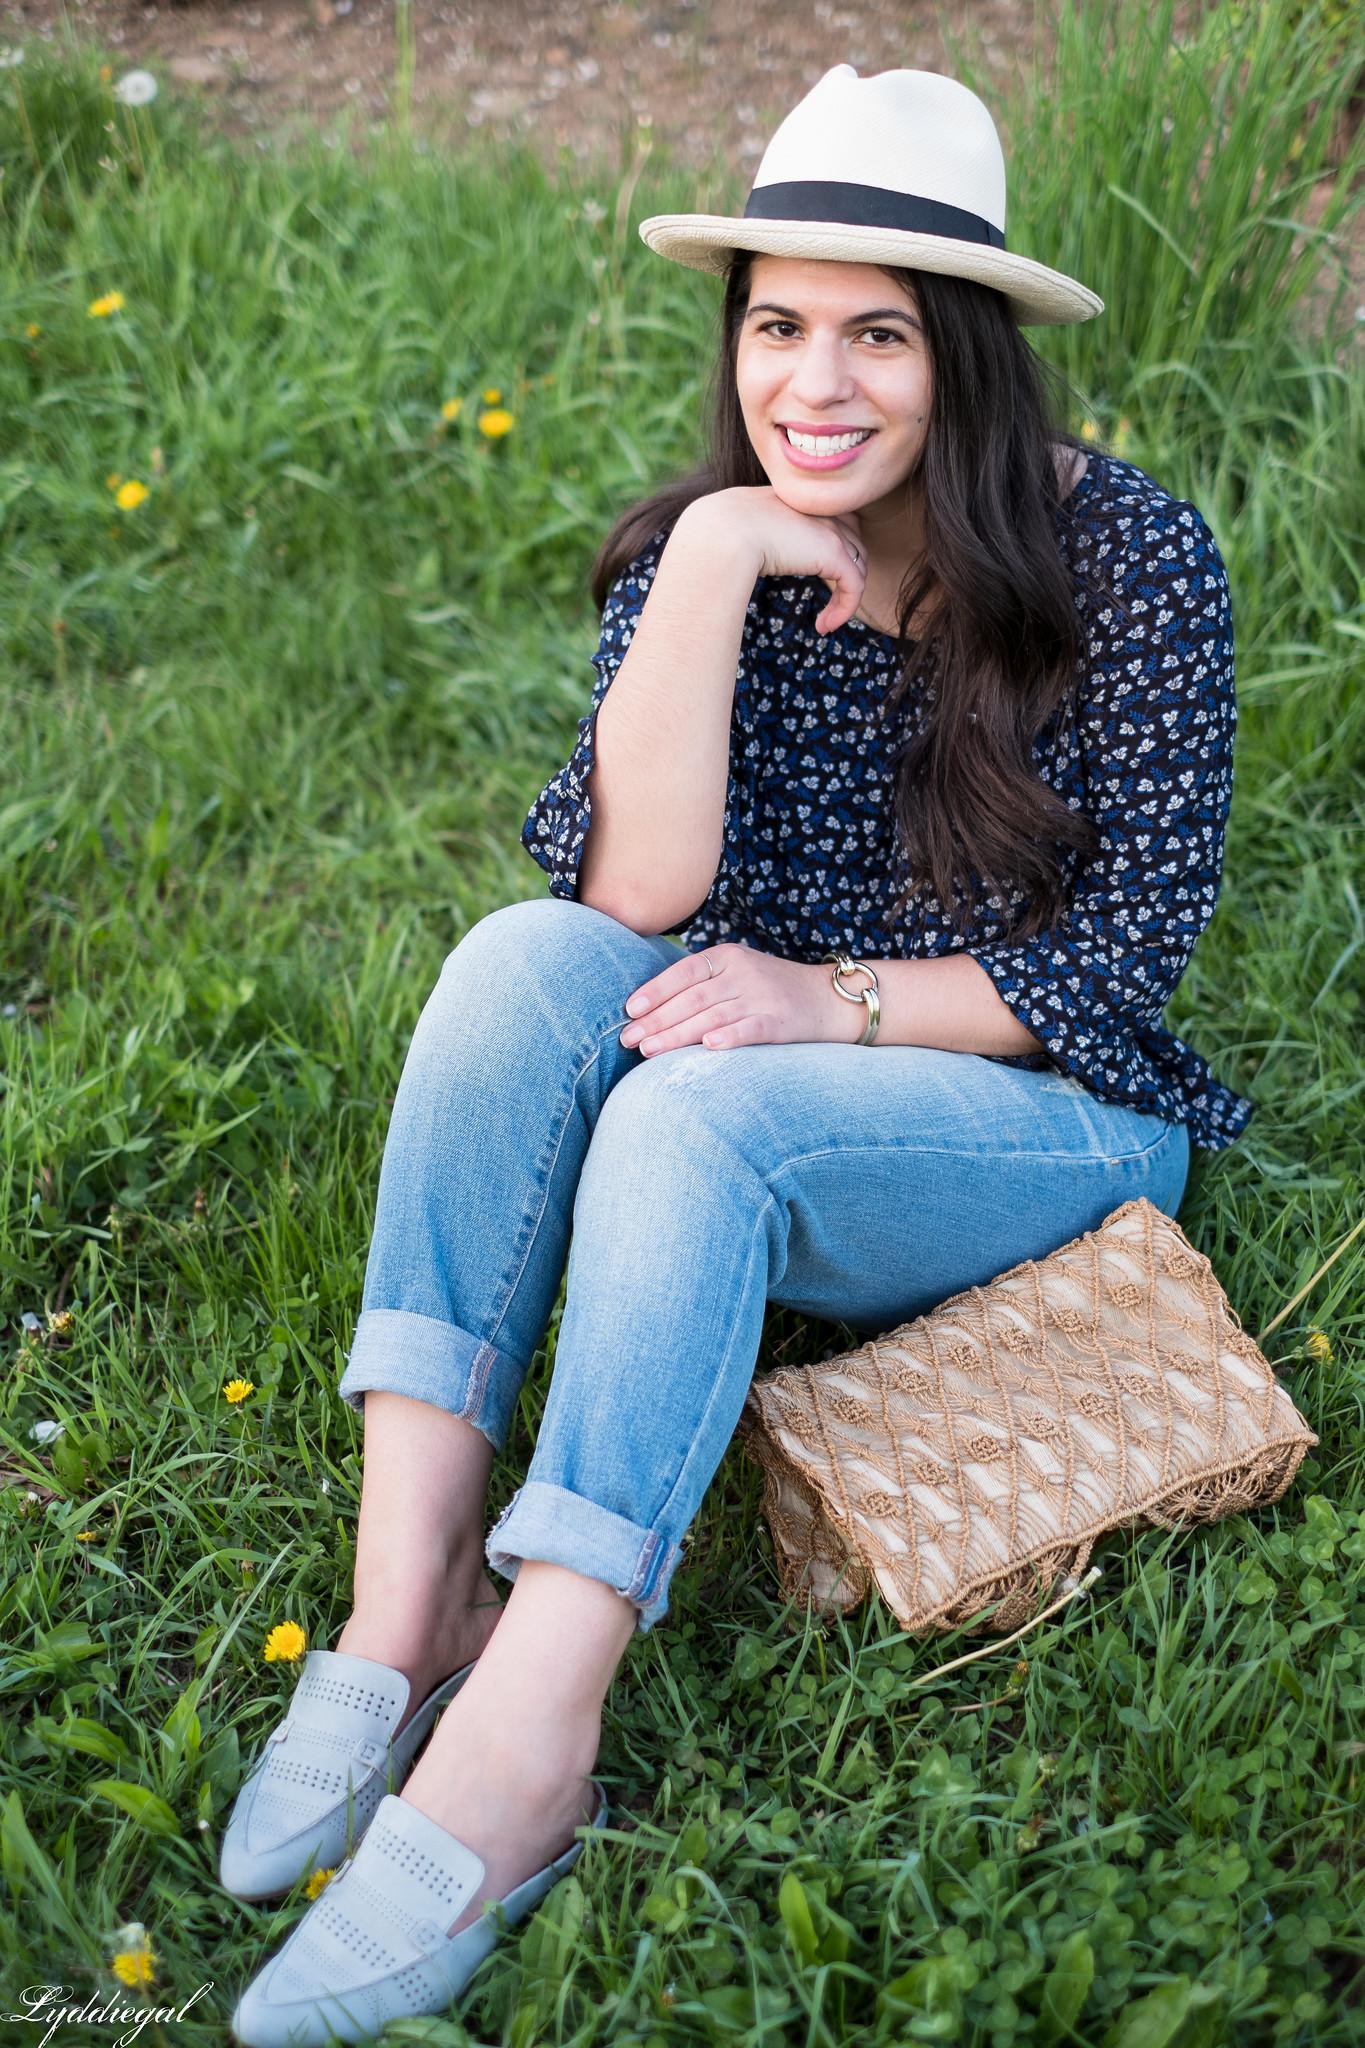 blue floral blouse, boyfriend jeans, loafers, macrame bag, panama hat-17.jpg